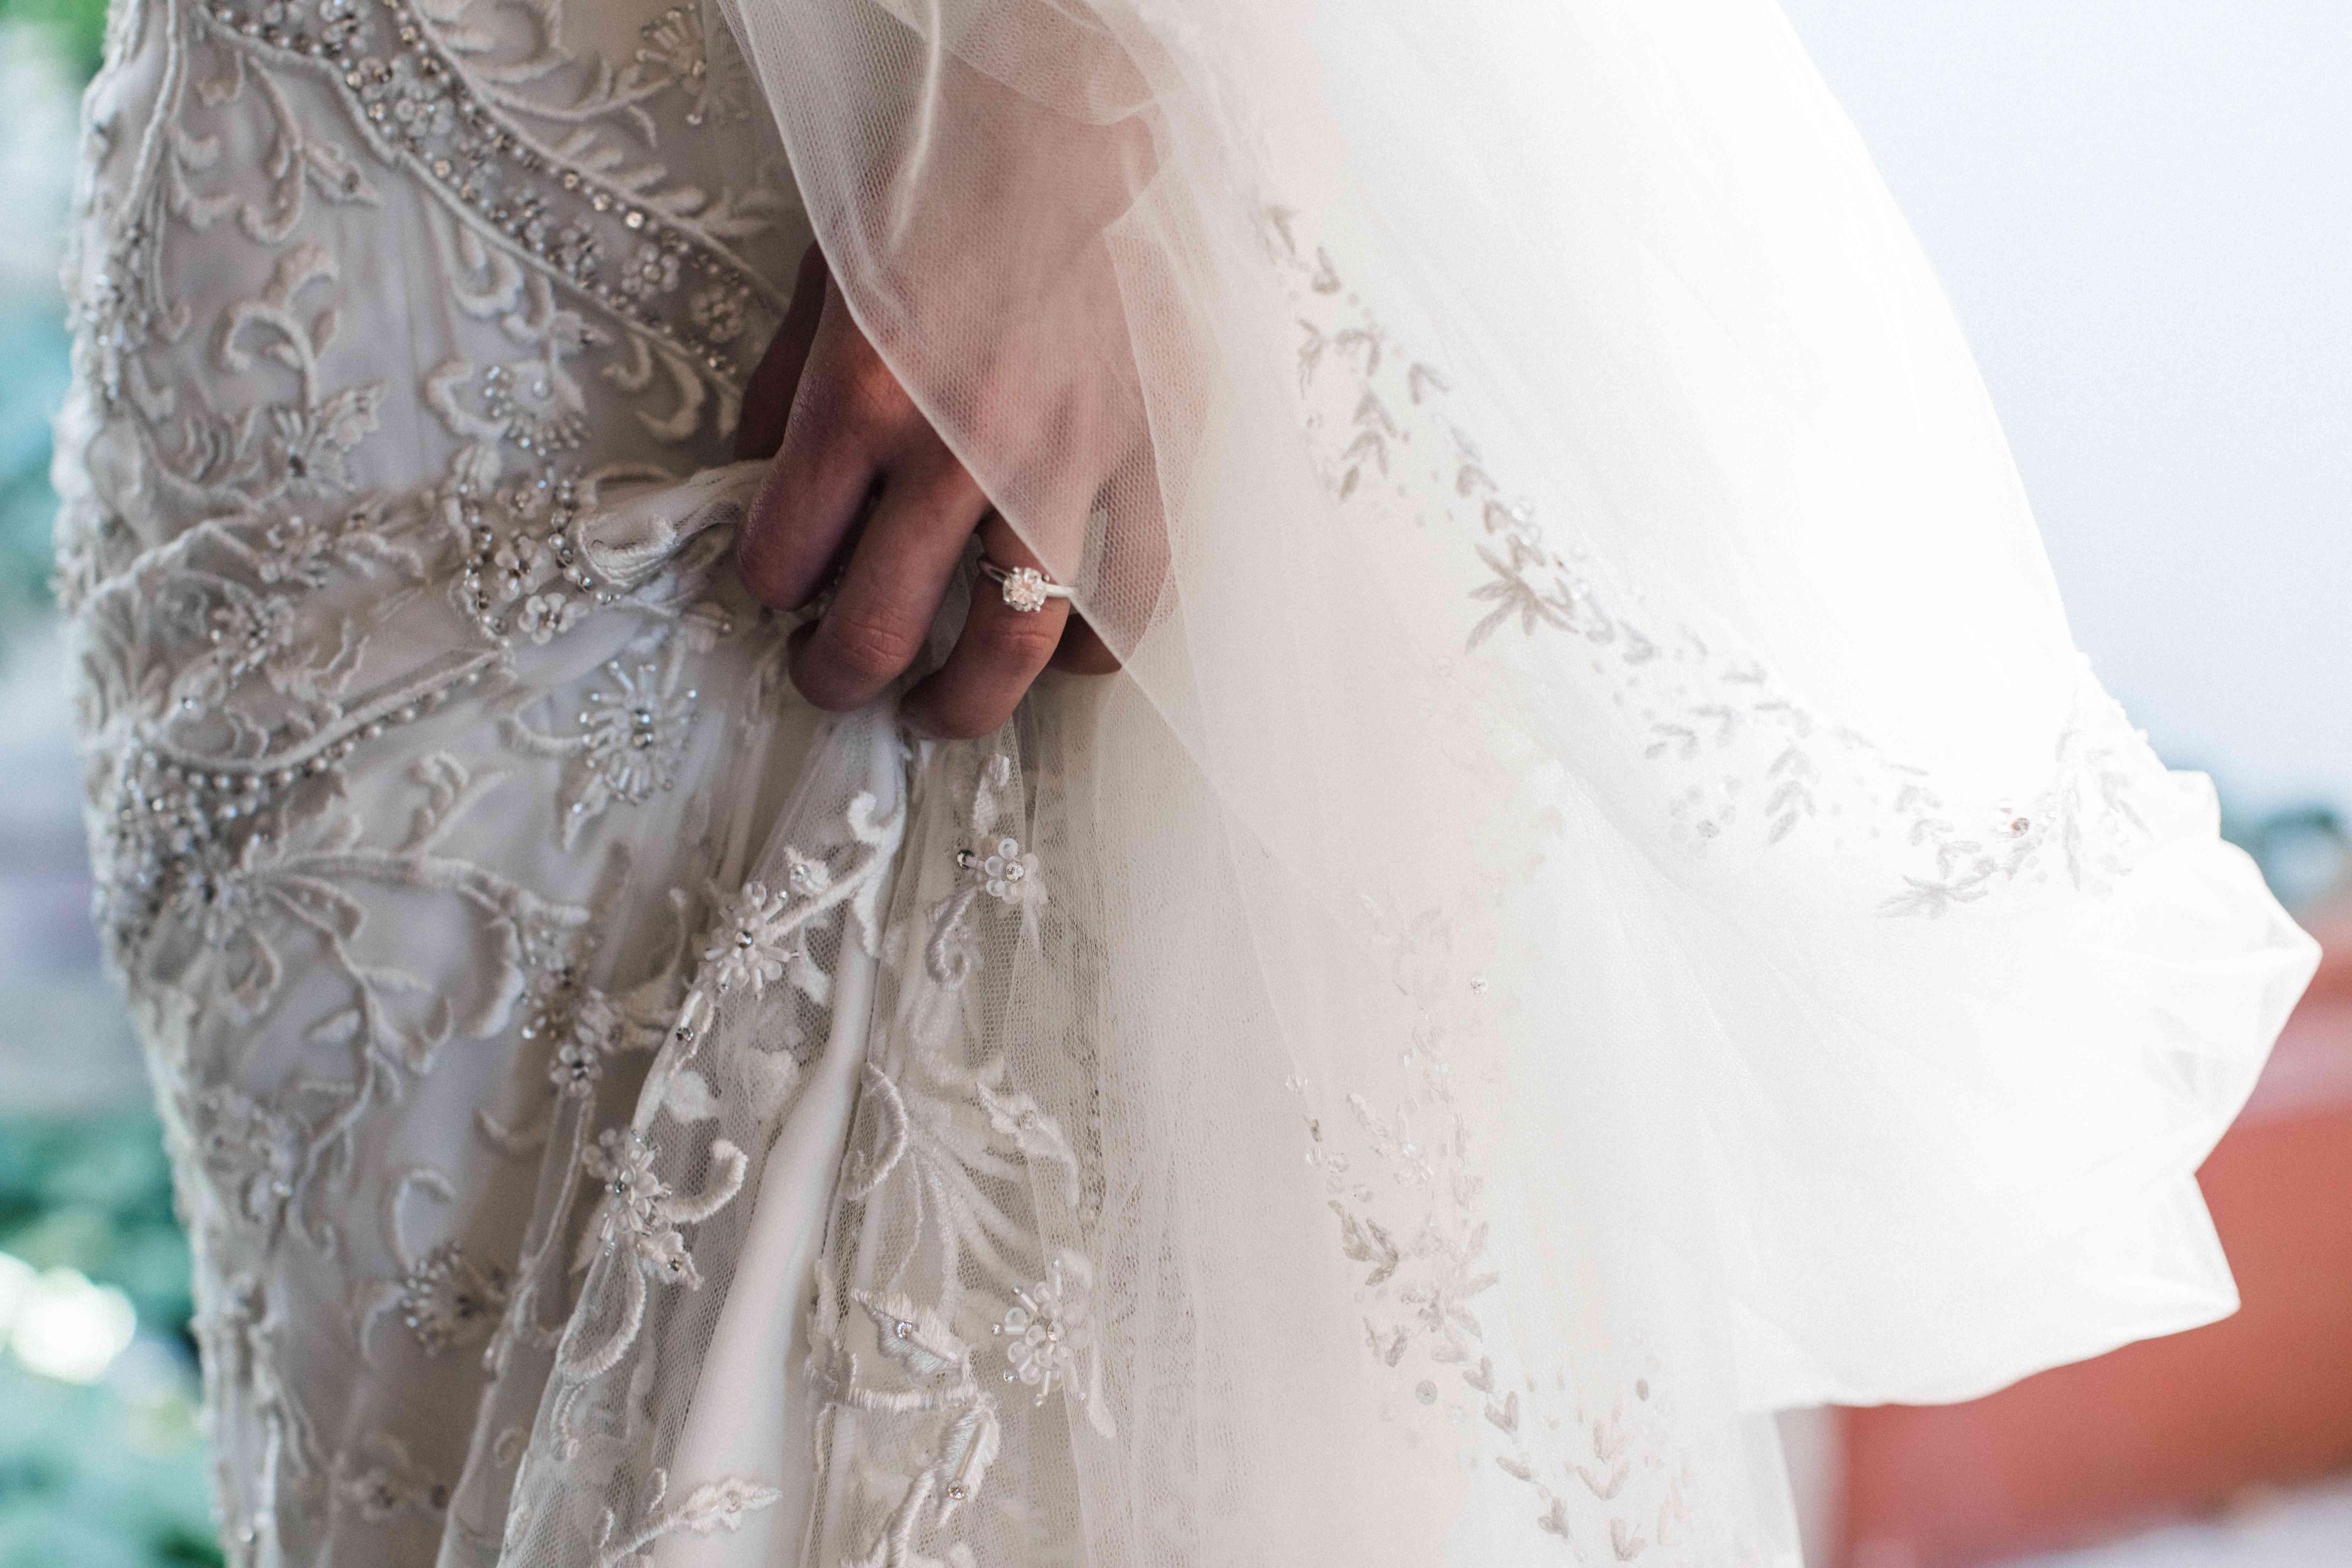 <p>wedding dress detail shot engagement ring</p><br><br>